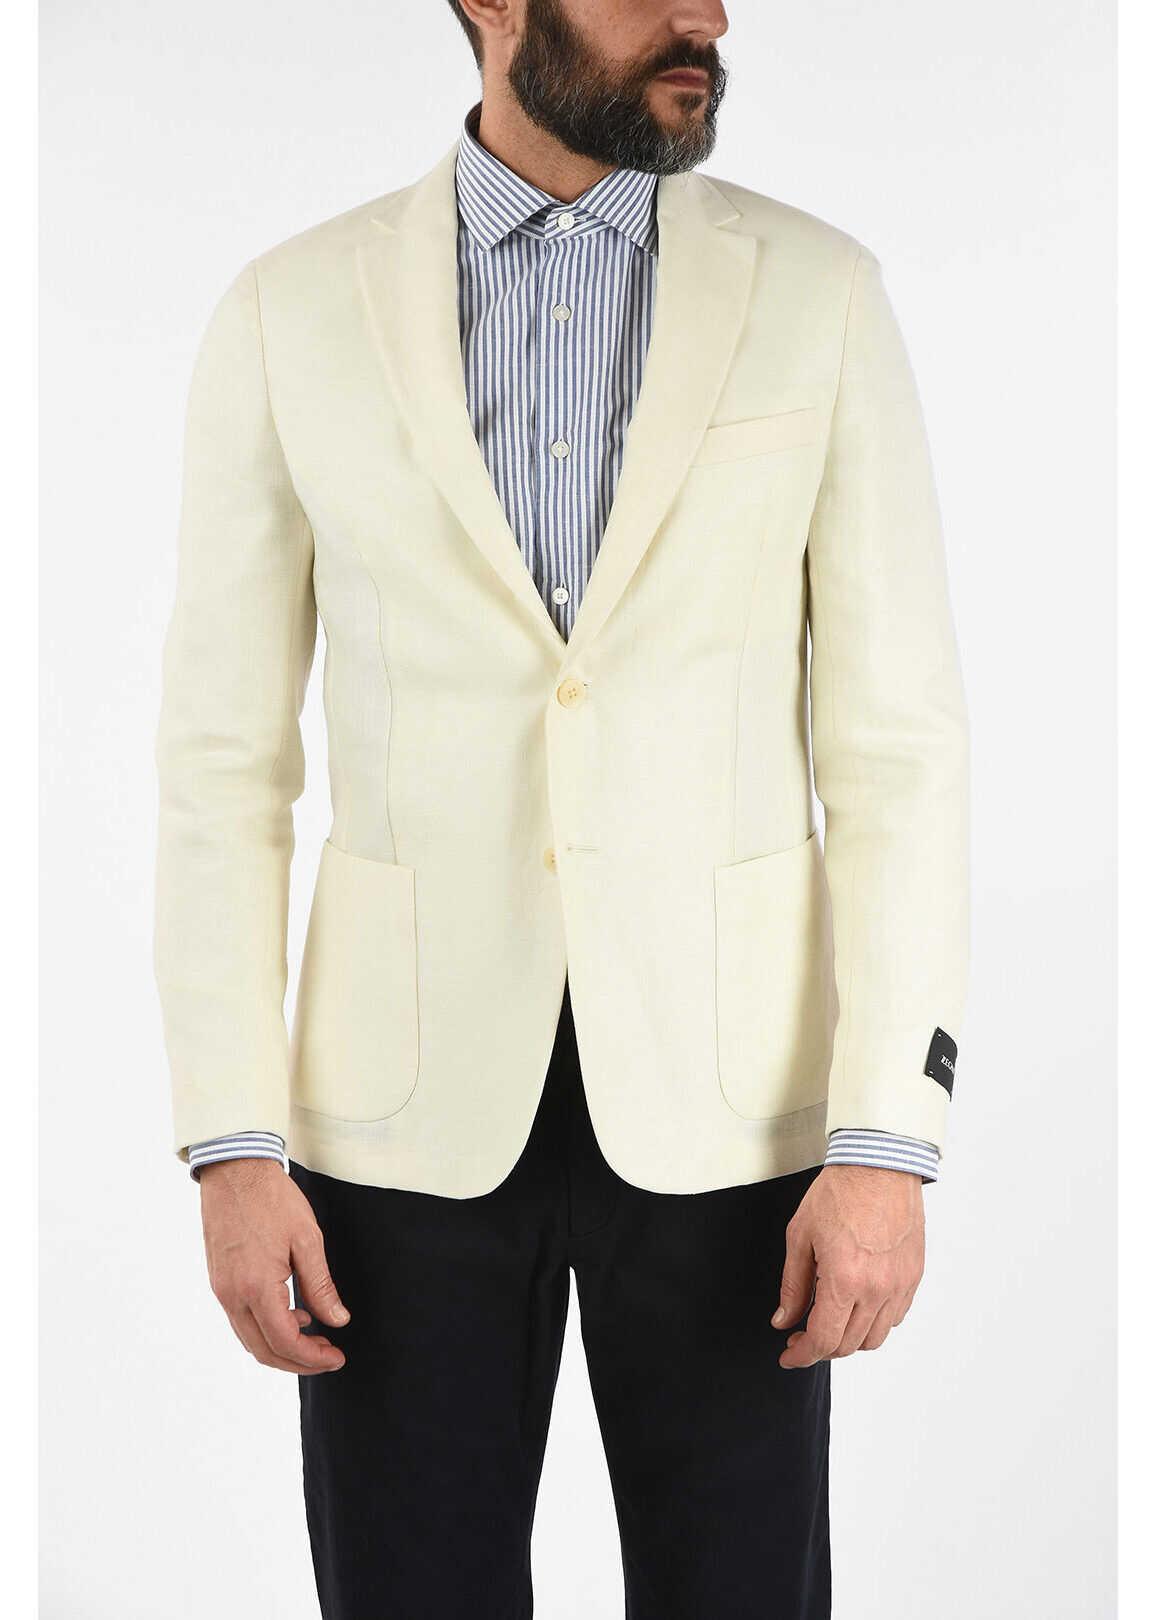 Ermenegildo Zegna ZZEGNA Linen and Wool 2 Button Blazer with Notch Lapels WHITE imagine